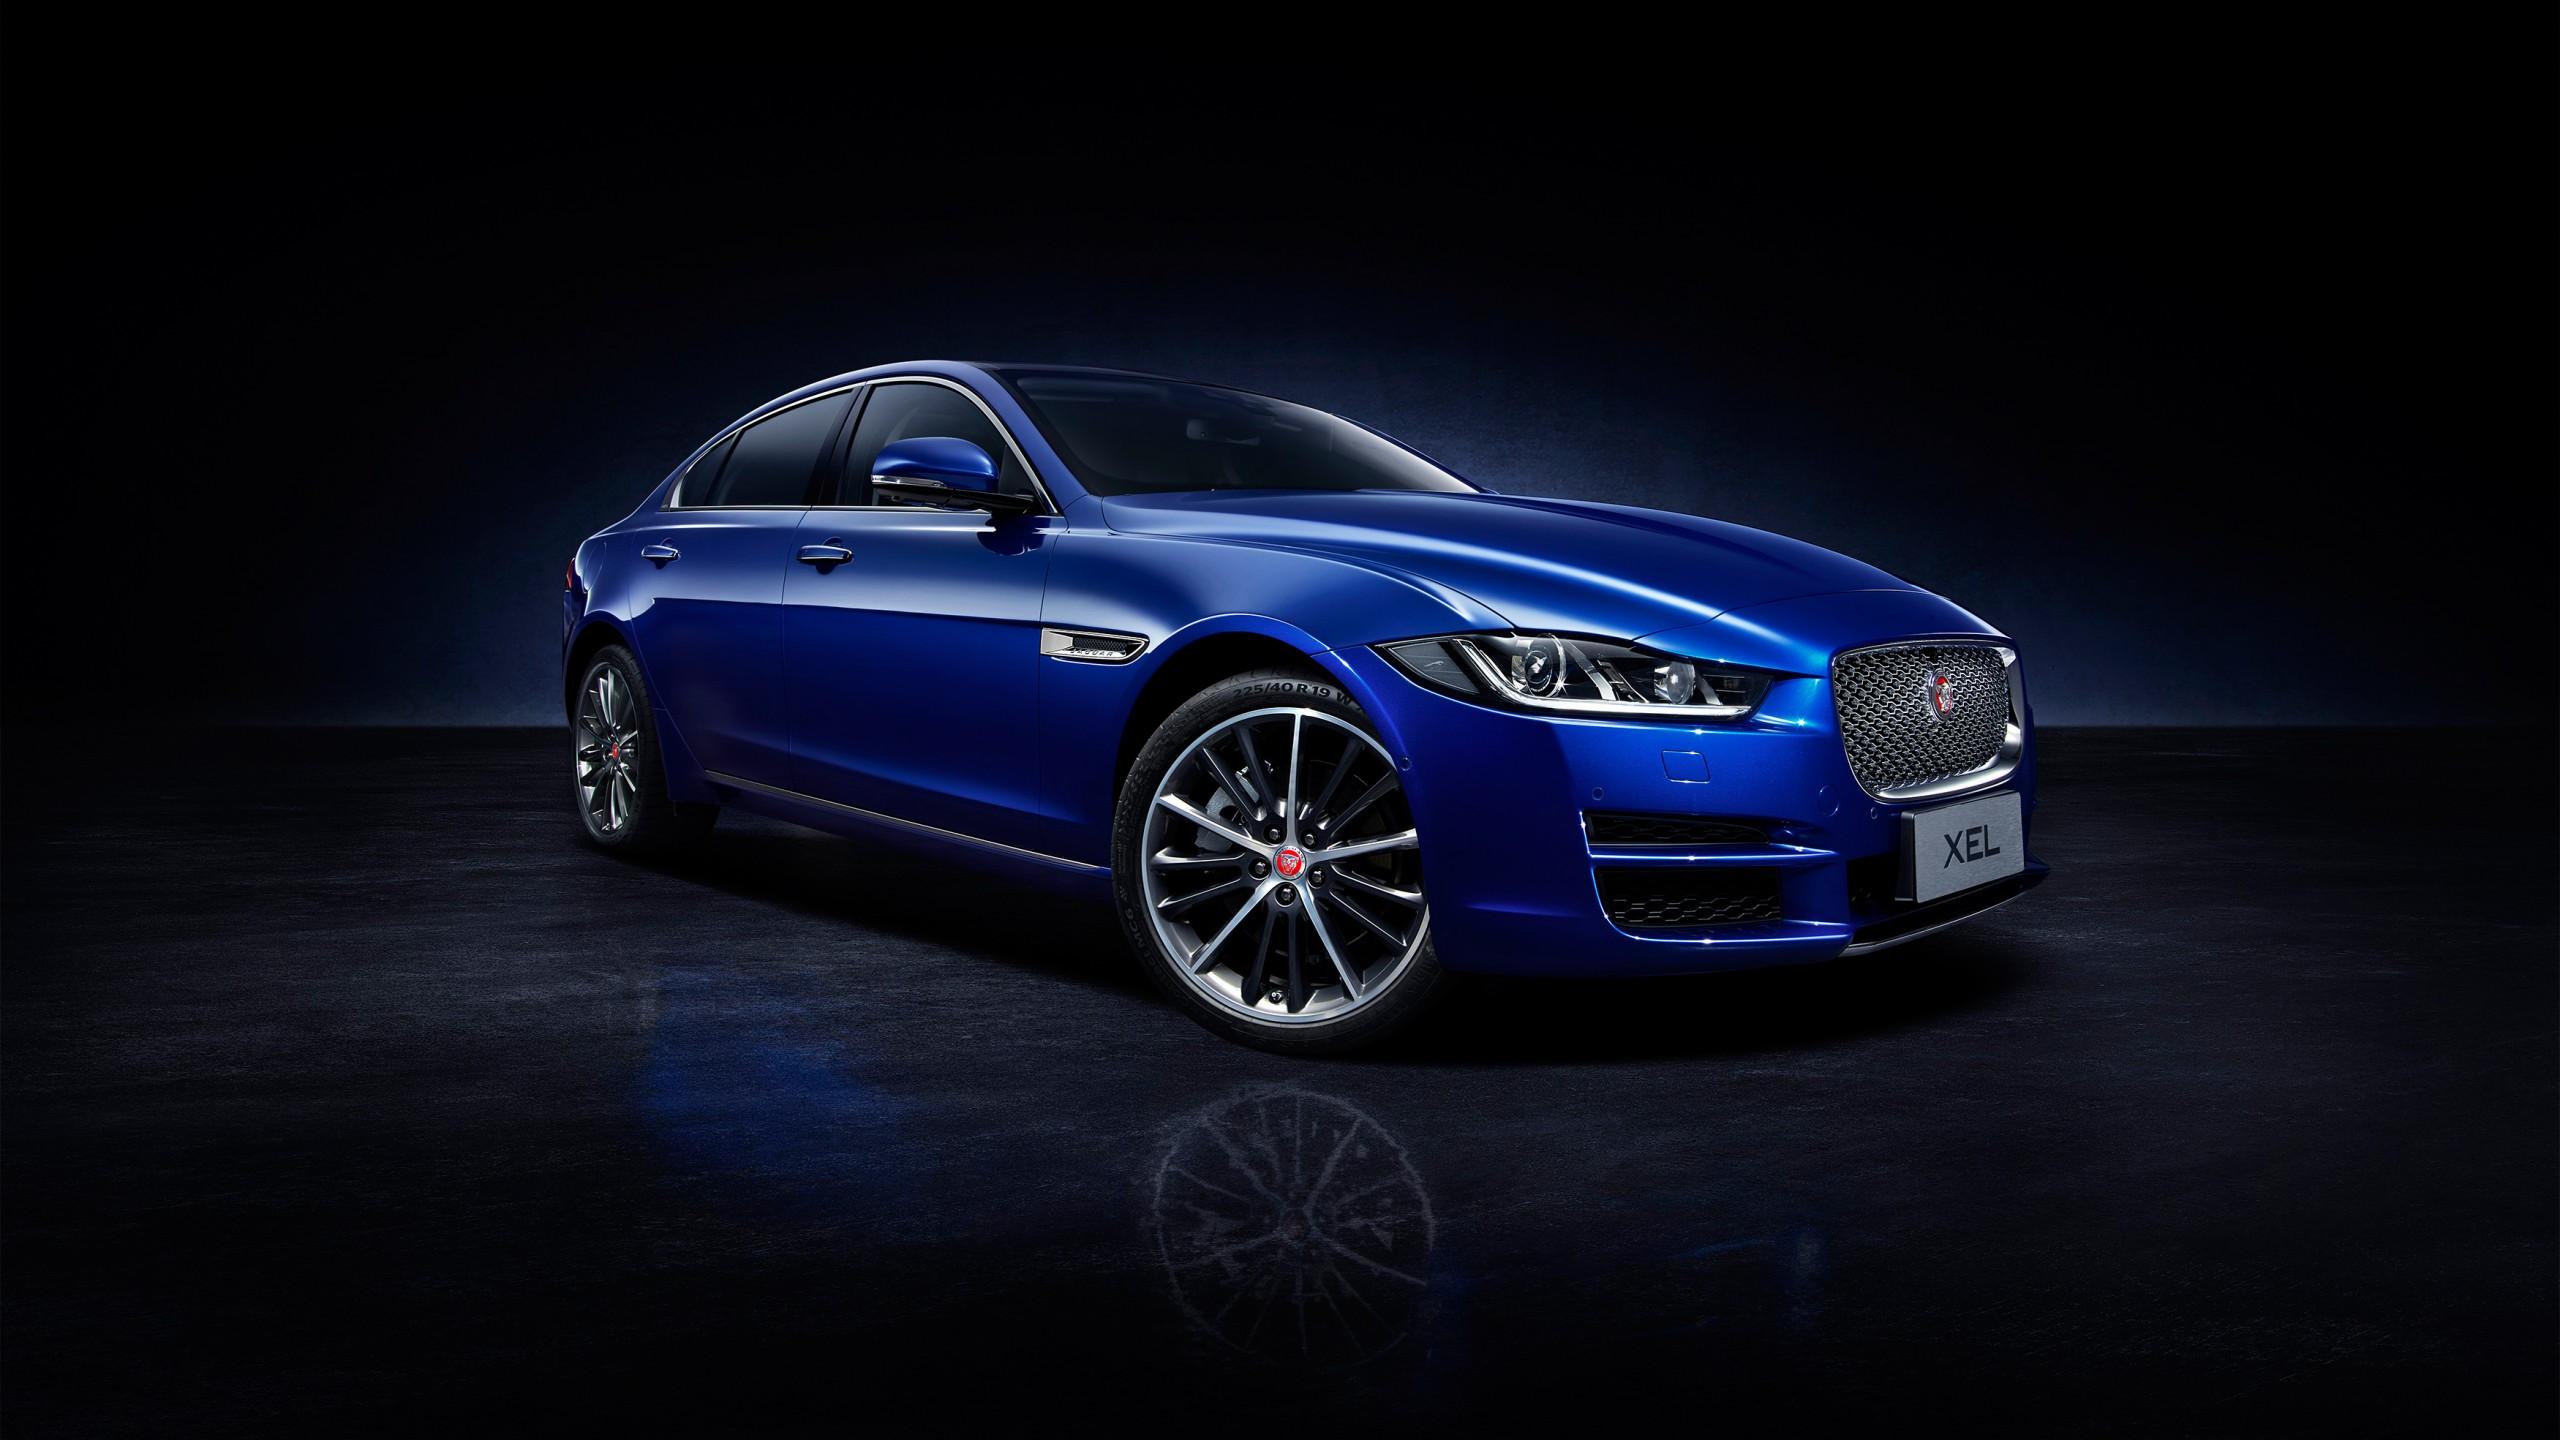 Jaguar XEL 2018 Wallpaper | HD Car Wallpapers | ID #9002